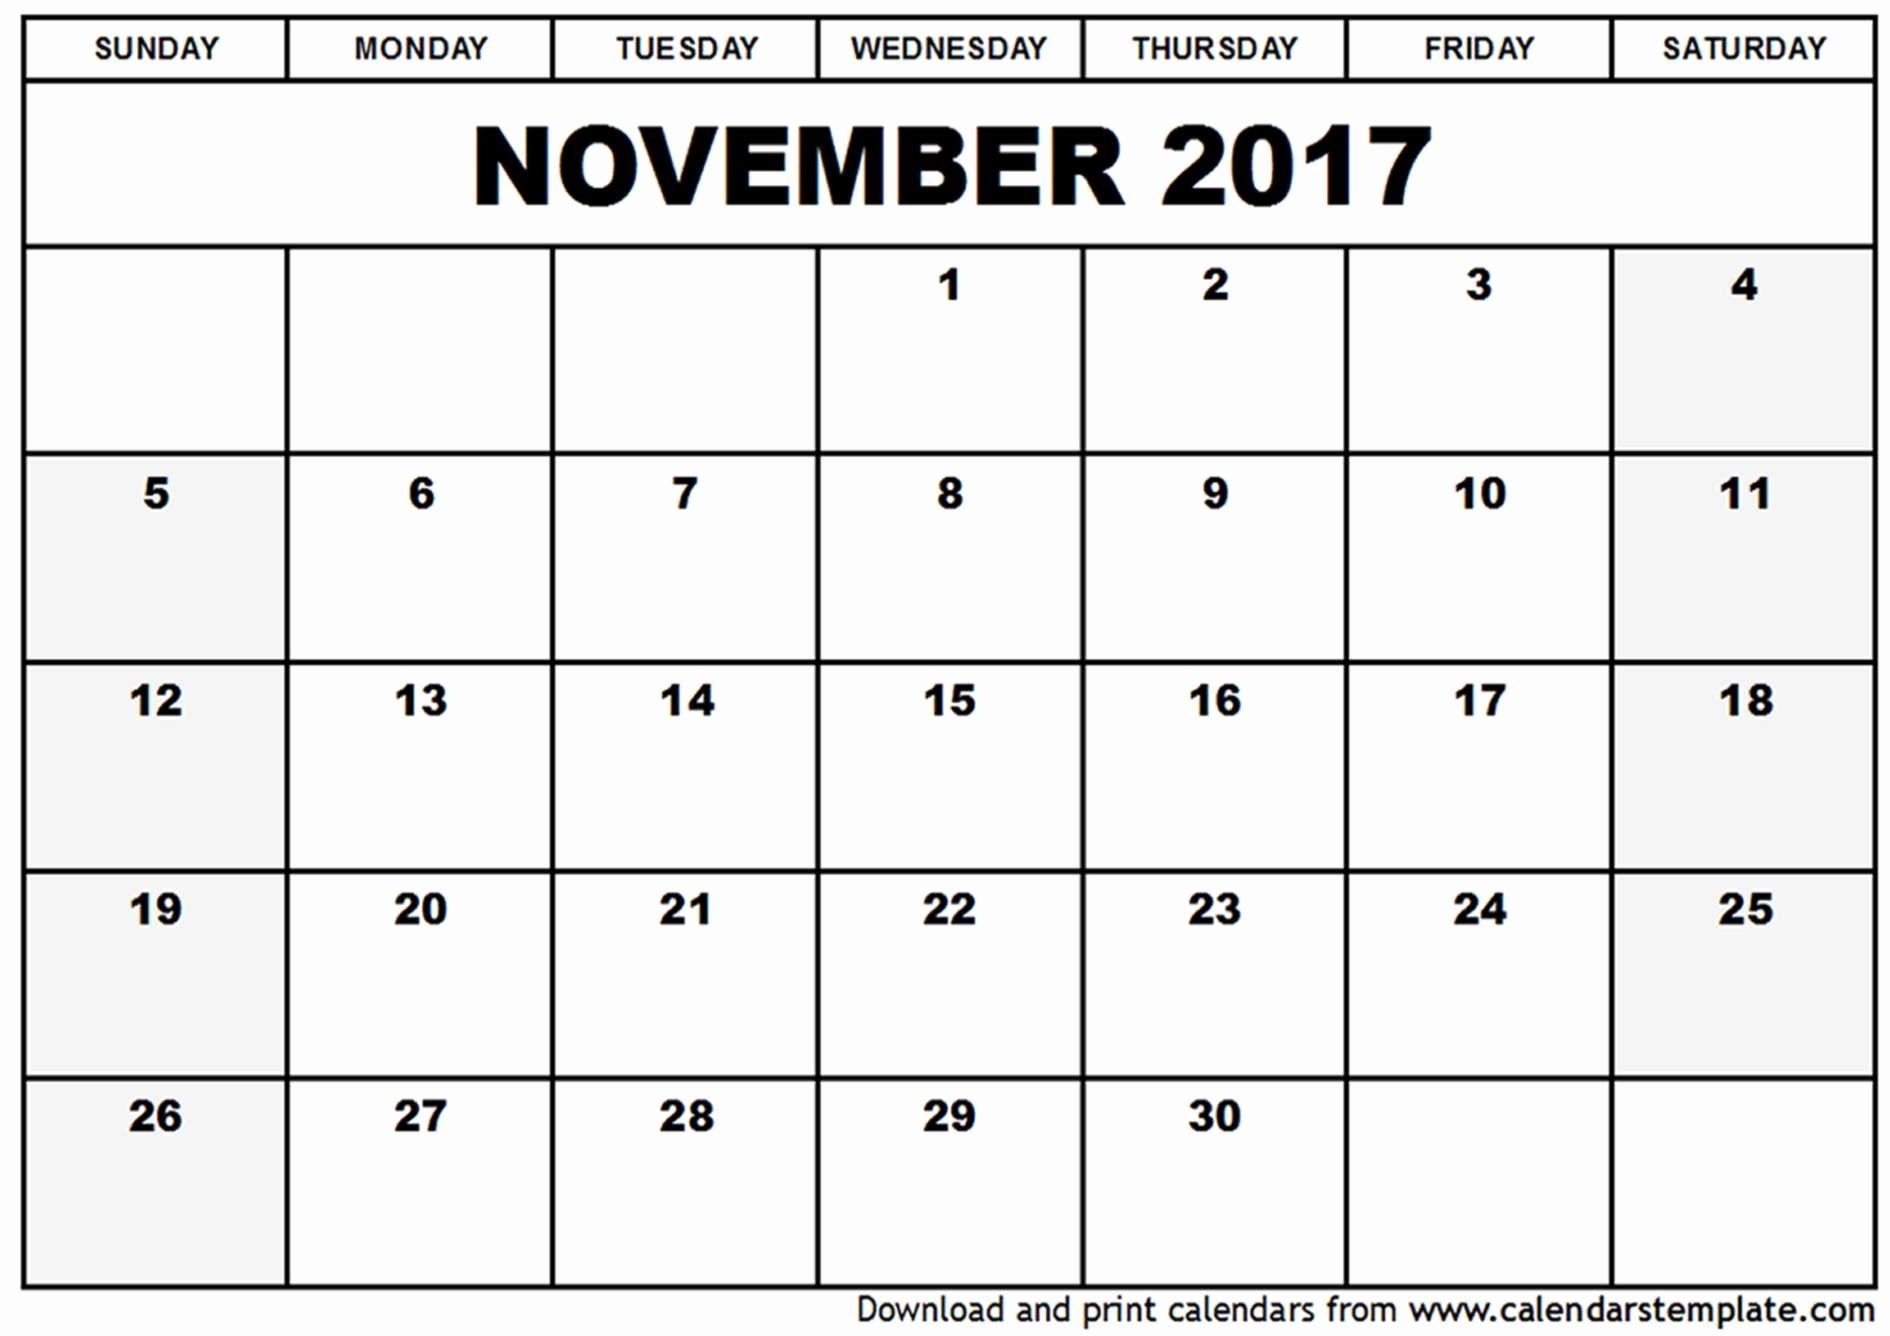 Blank Calendar Template August 2017 Elegant November 2017 Calendar Template